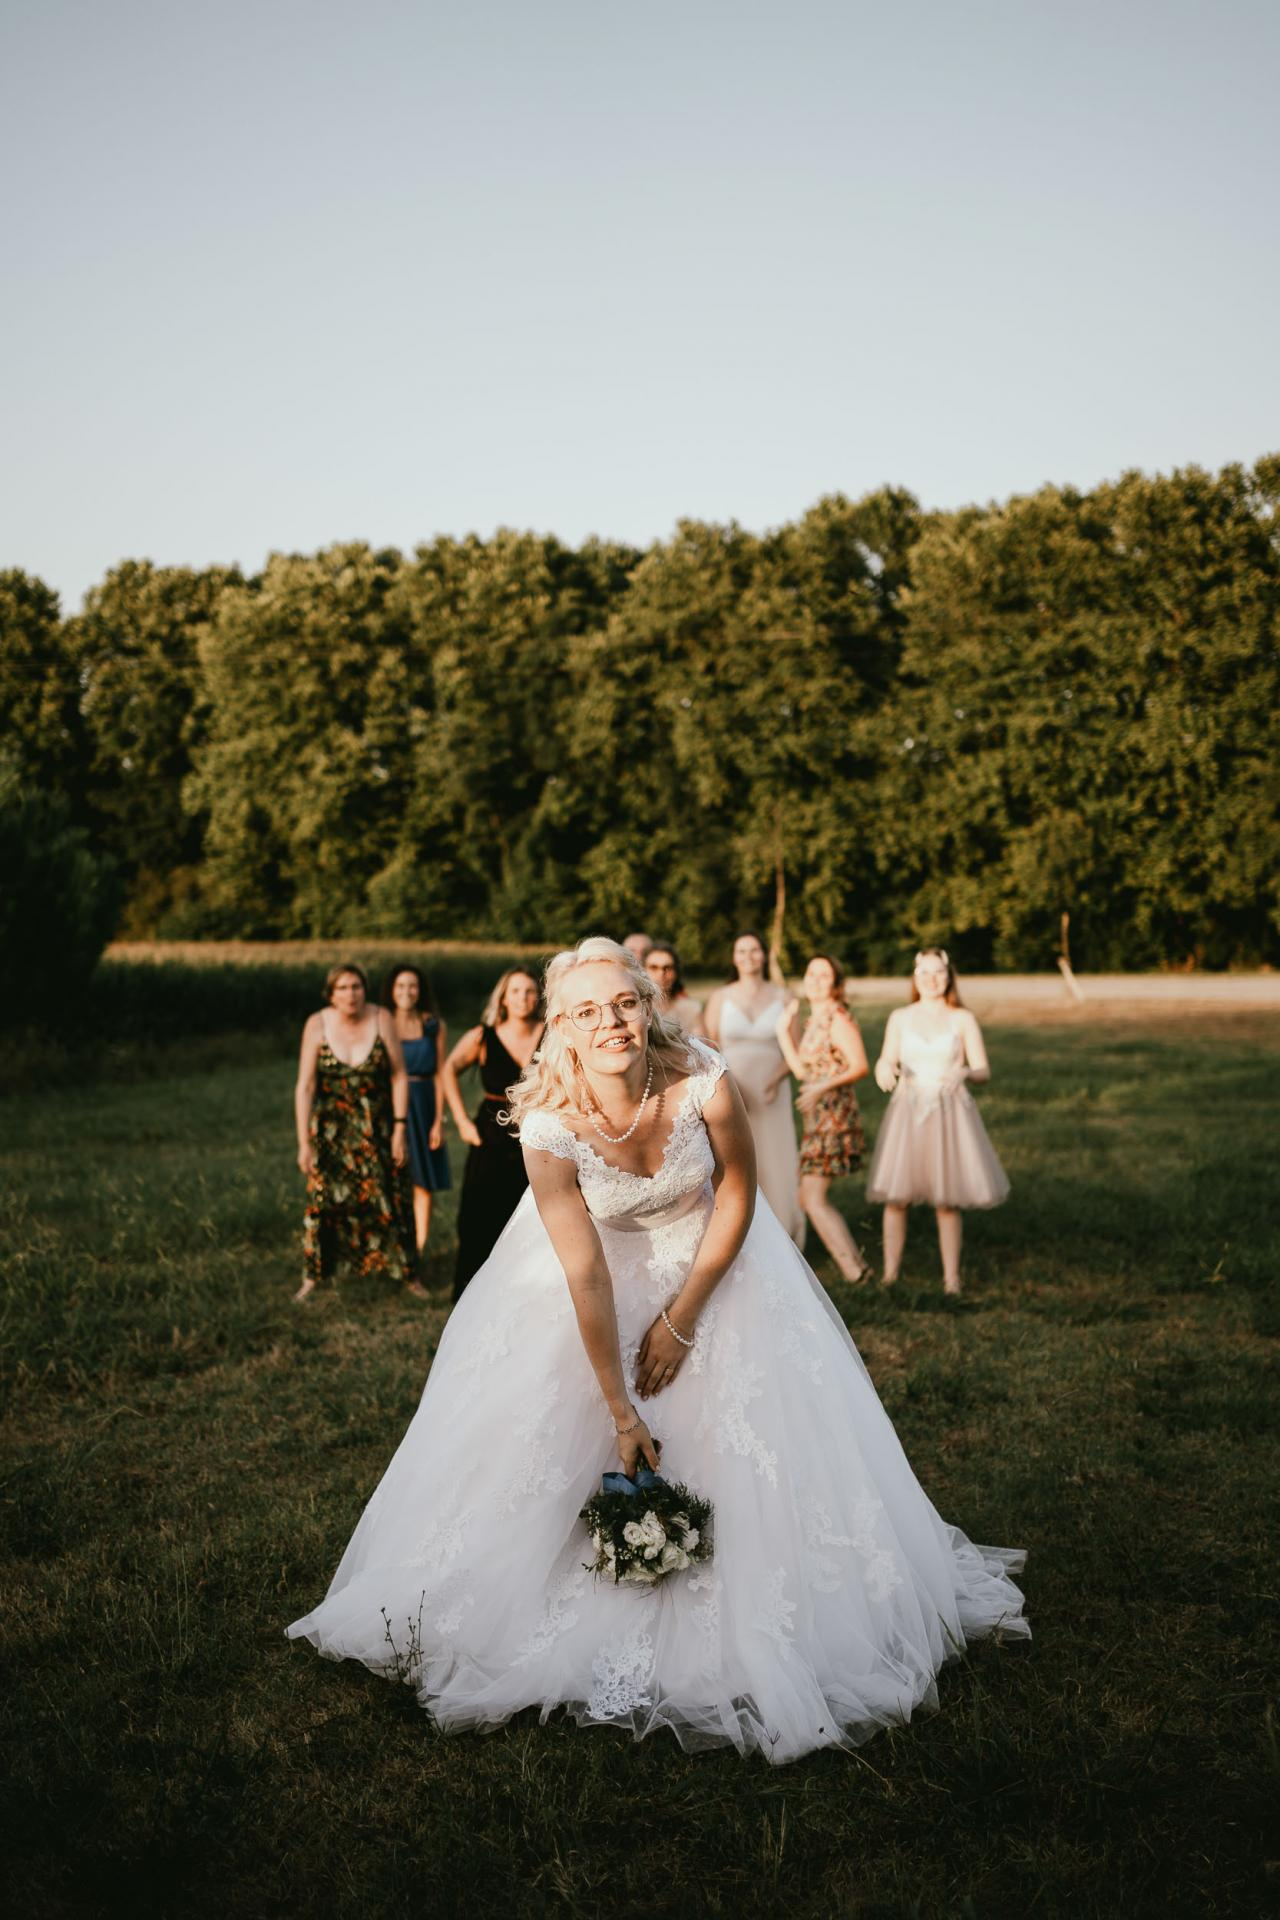 Photographe de mariage moody boho chic boheme dax landes aquitaine fineart 18